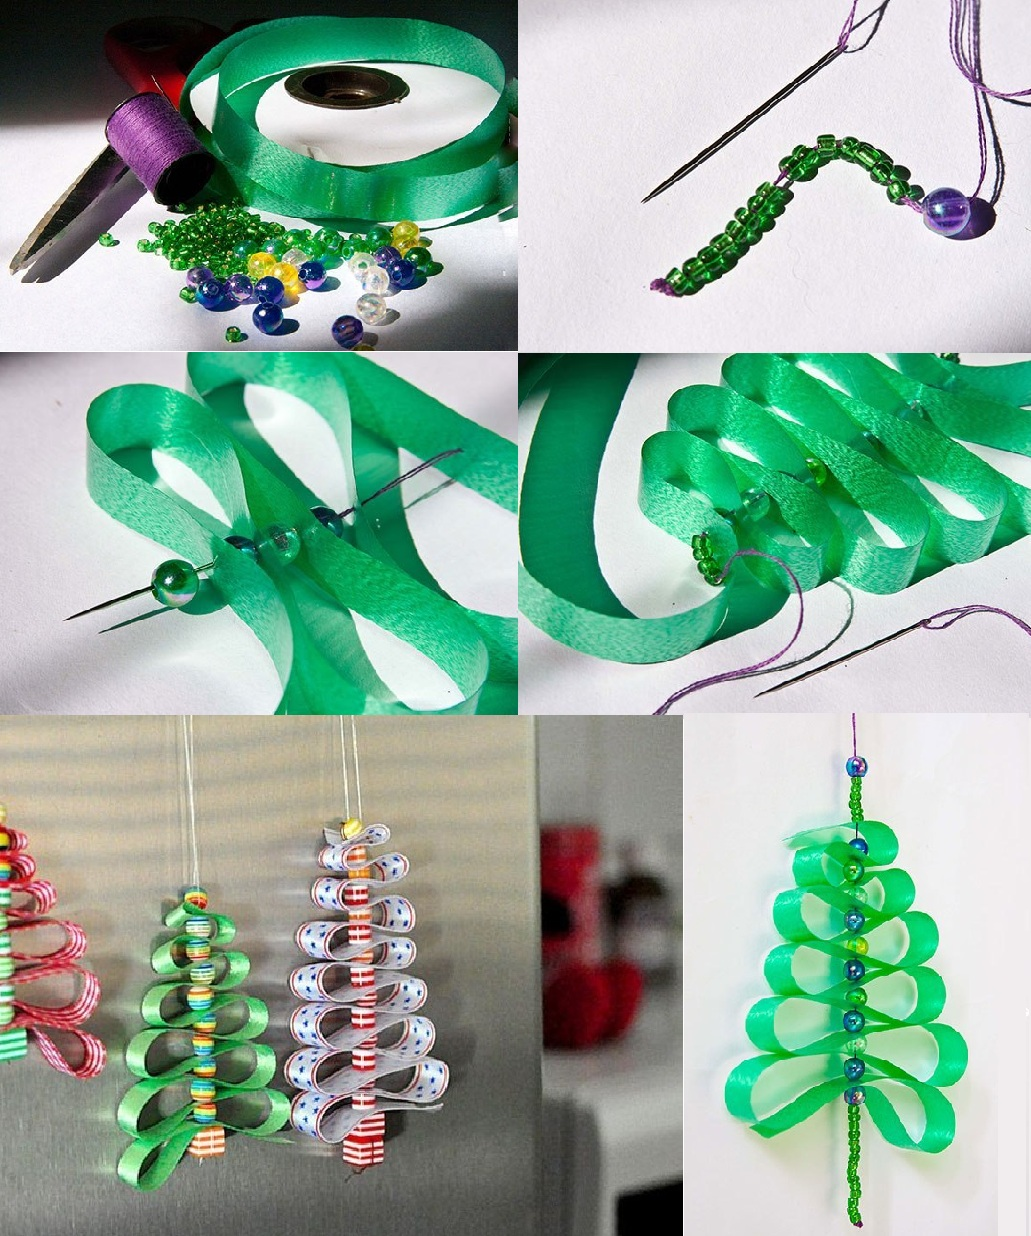 Para estas fiestas arbolitos navide os para colgar como for Manualidades souvenirs navidenos